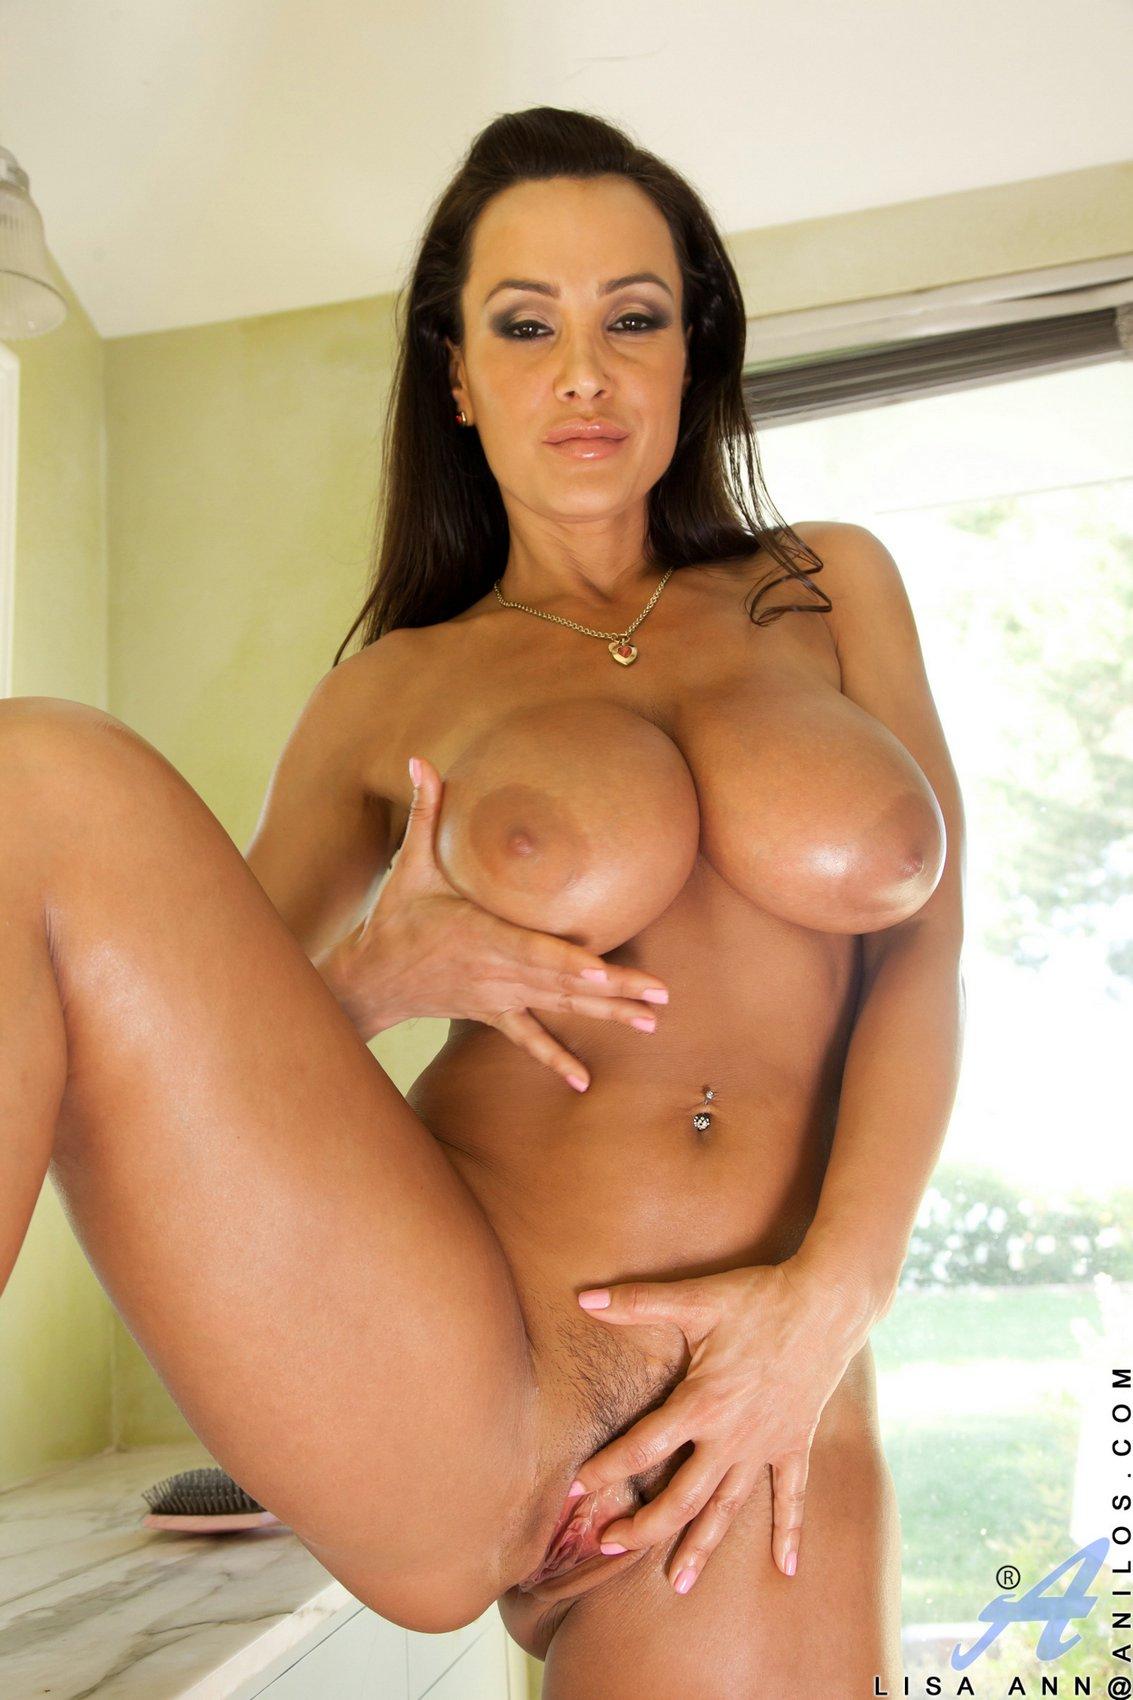 Cougar latina taking my bbc again 3